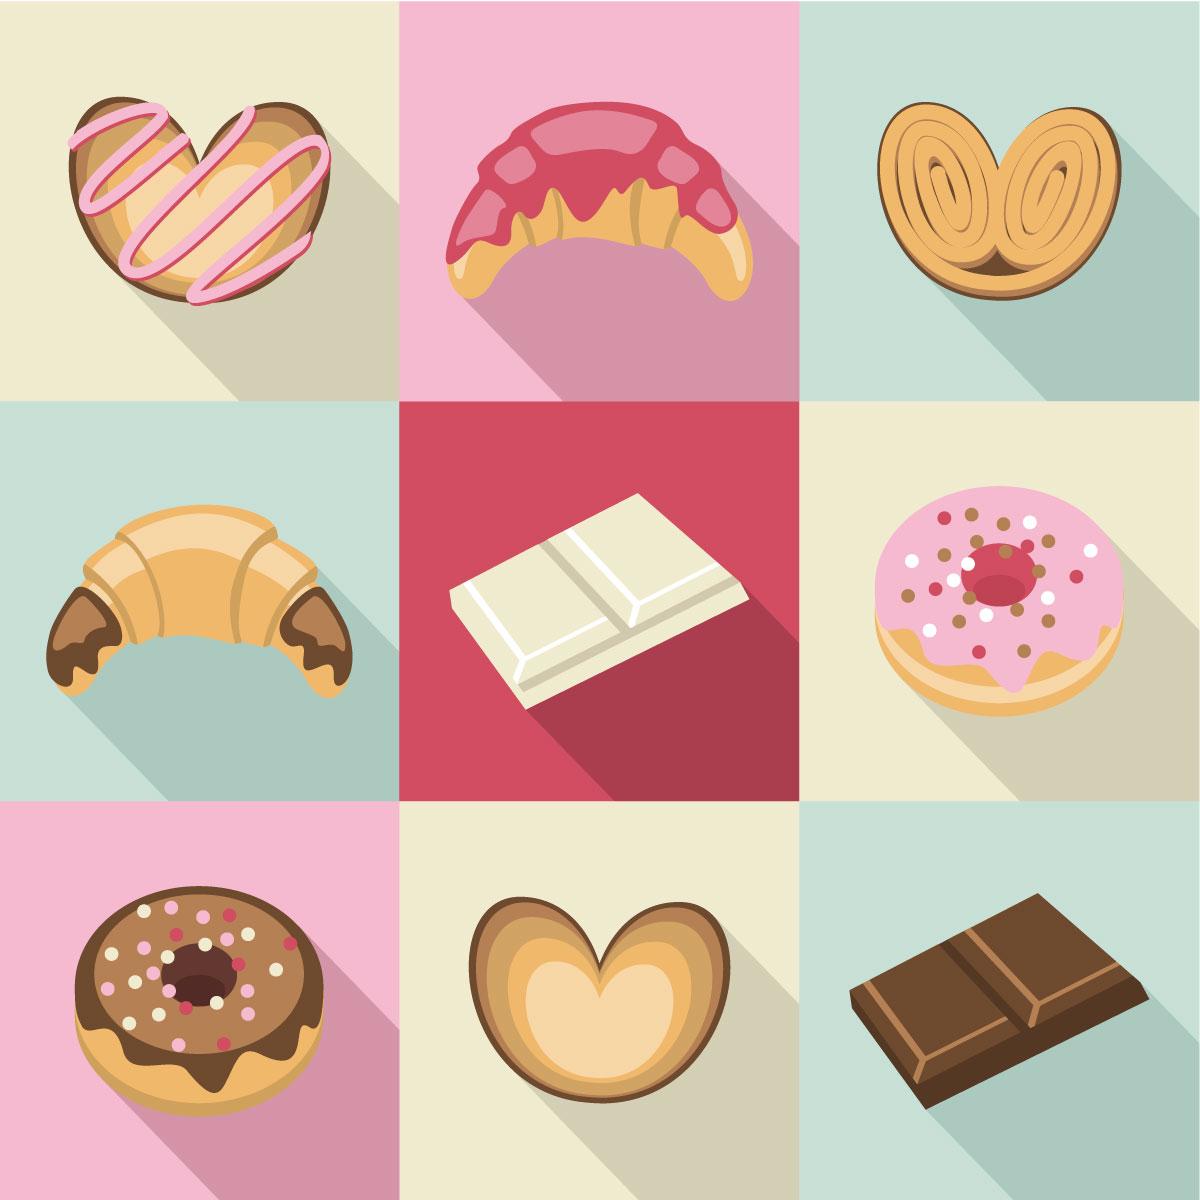 (c) Candy-bazar.ch